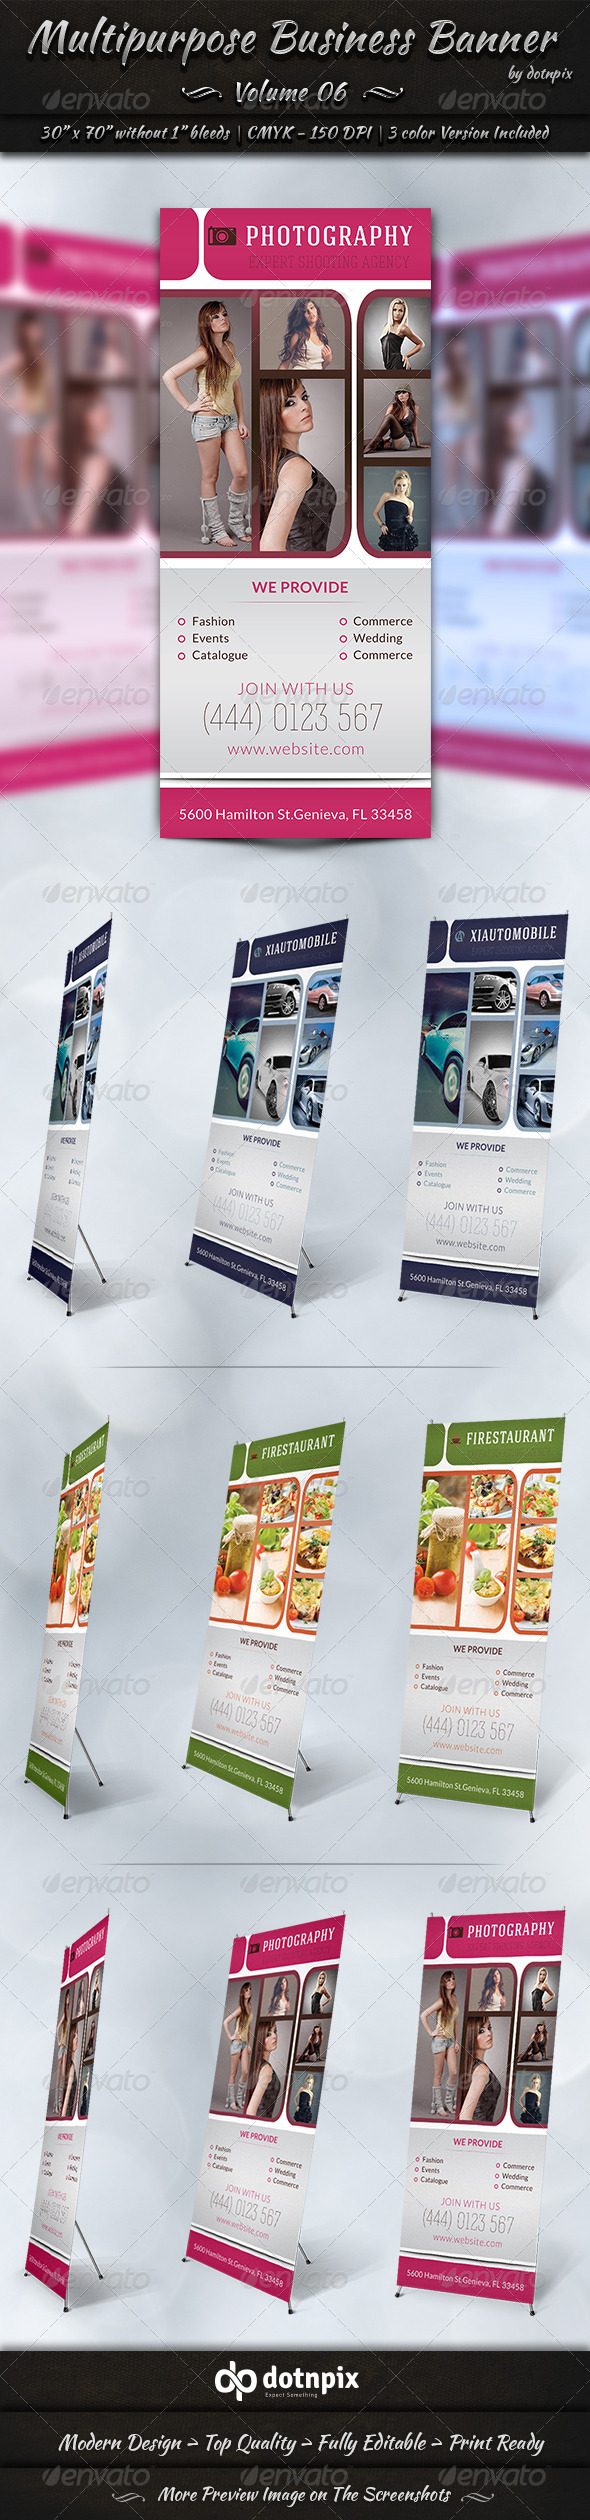 GraphicRiver Multipurpose Business Banner Volume 6 7817826